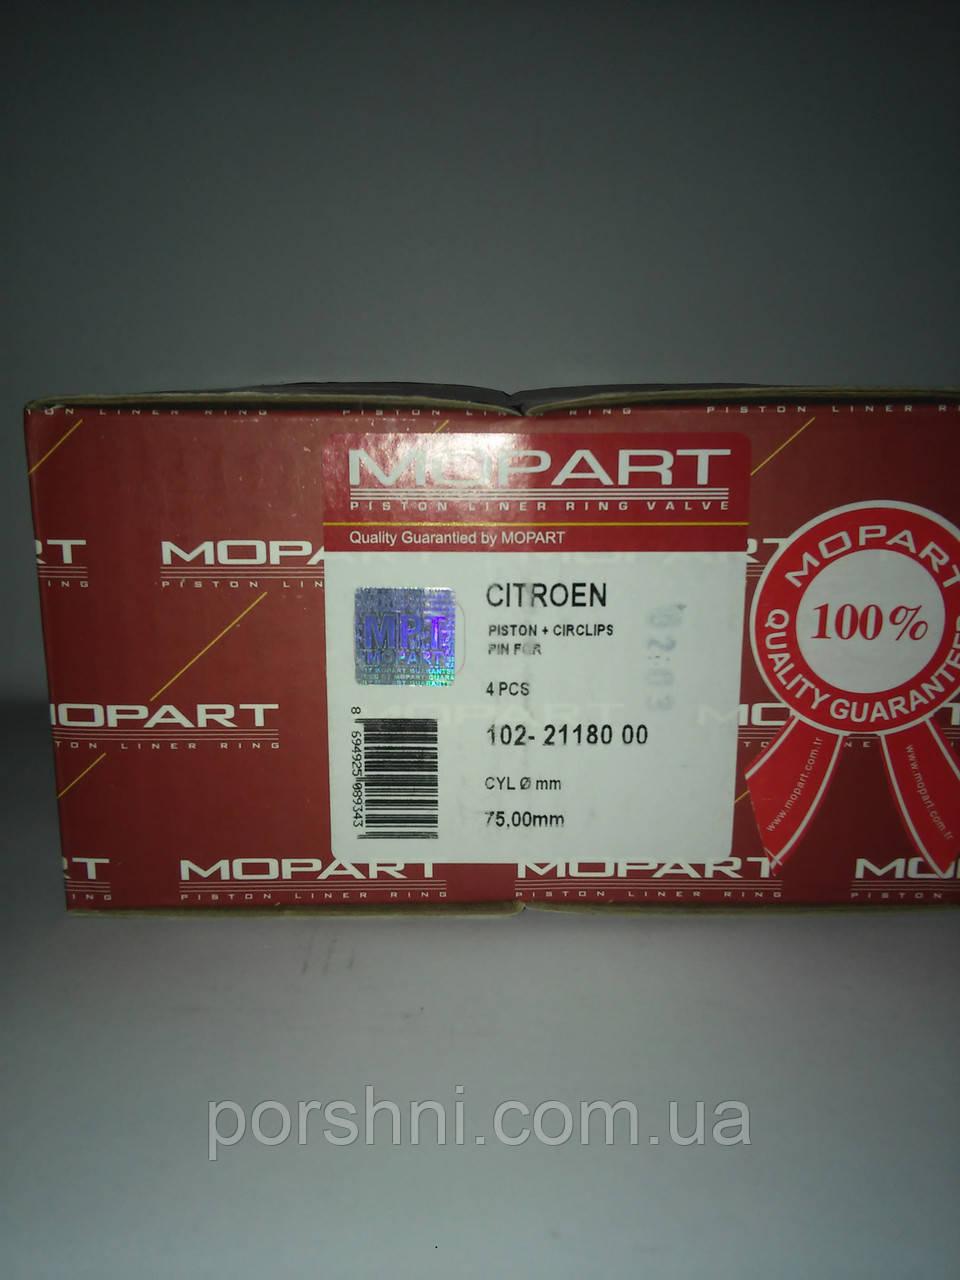 Поршни Citroen 1.4  ( 1.75 х 2 х 3 )          диам. 75 Mopisan 211800